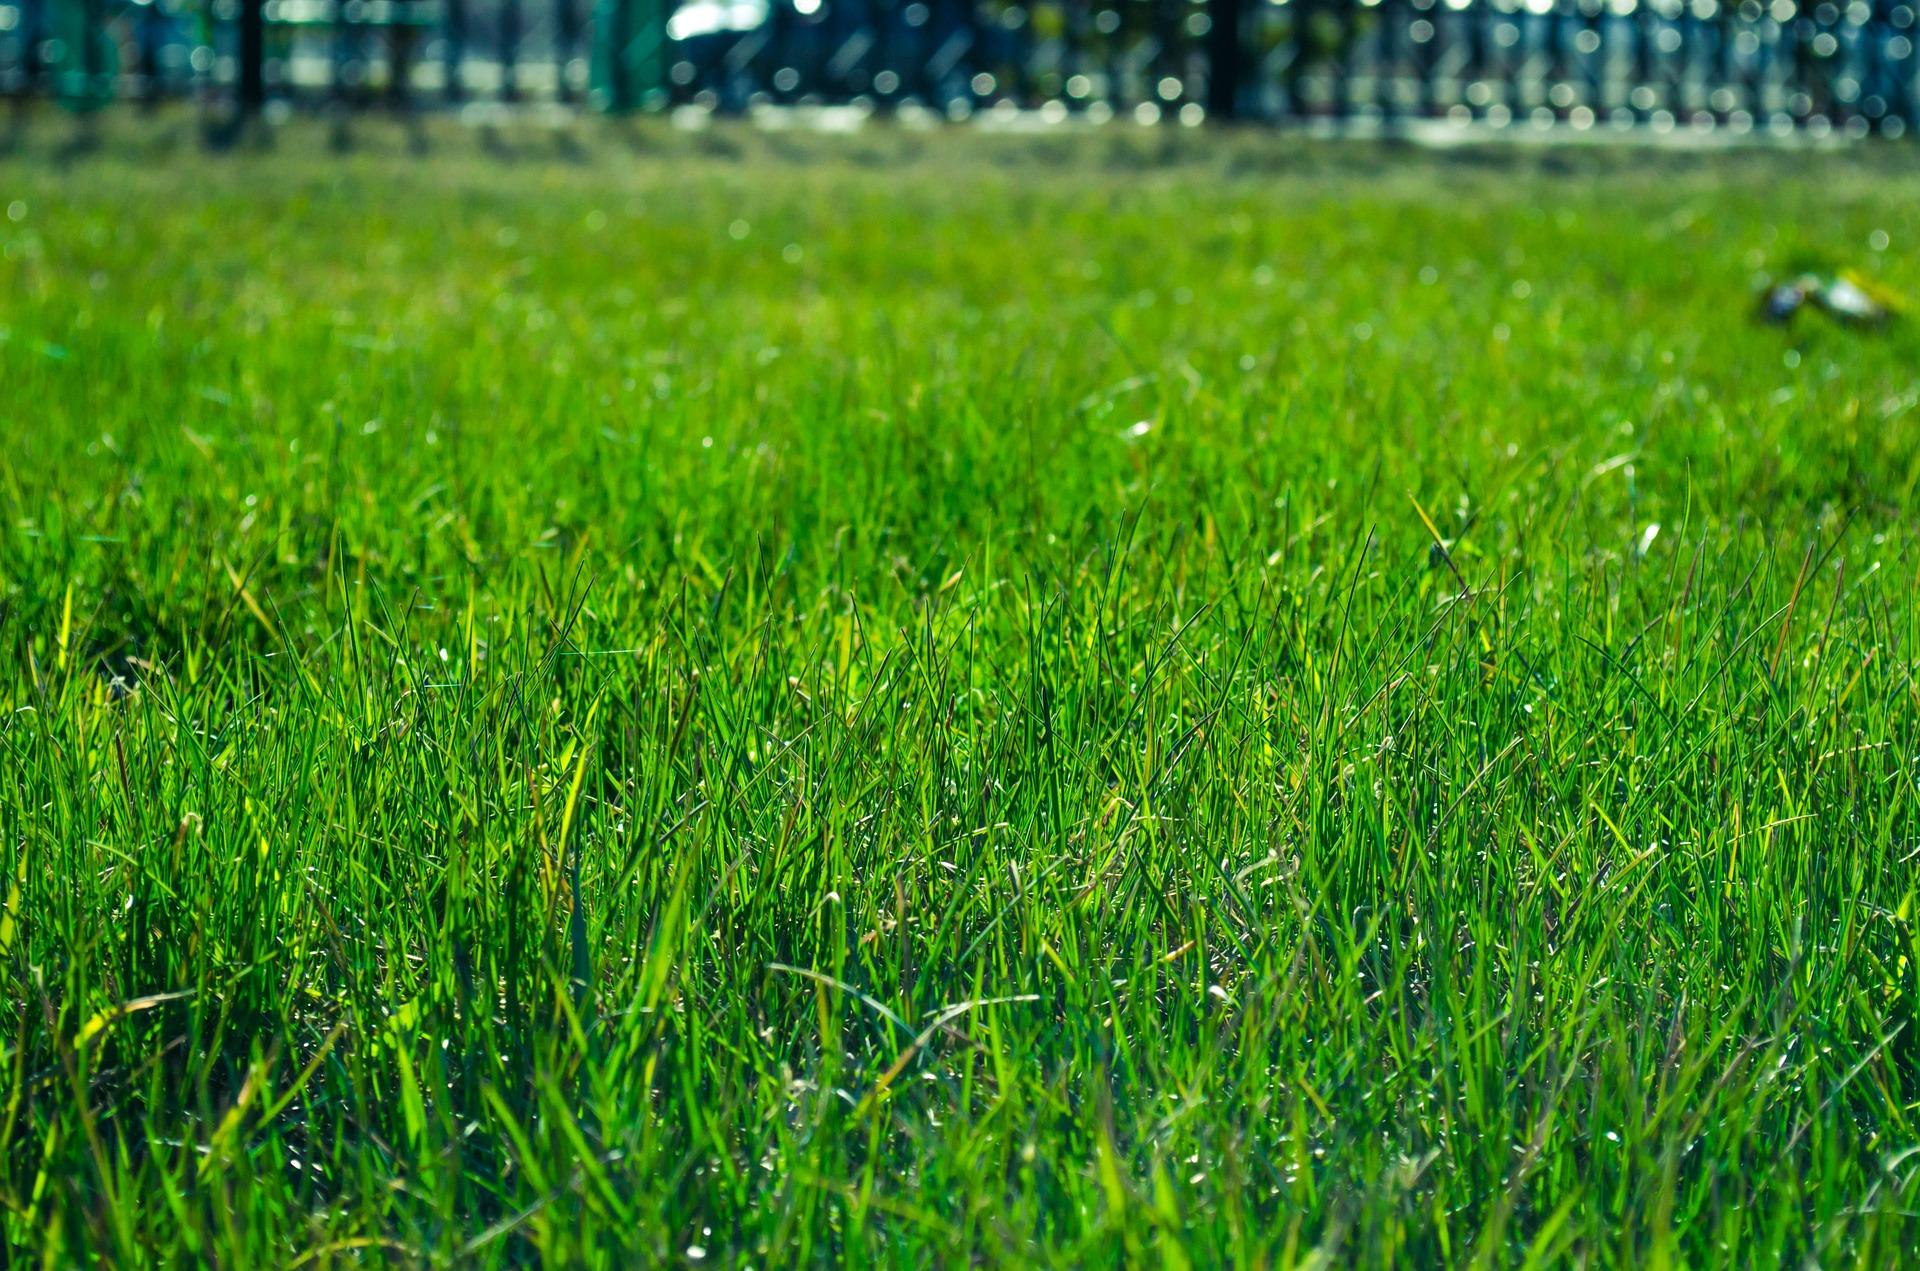 lawn-327333_1920